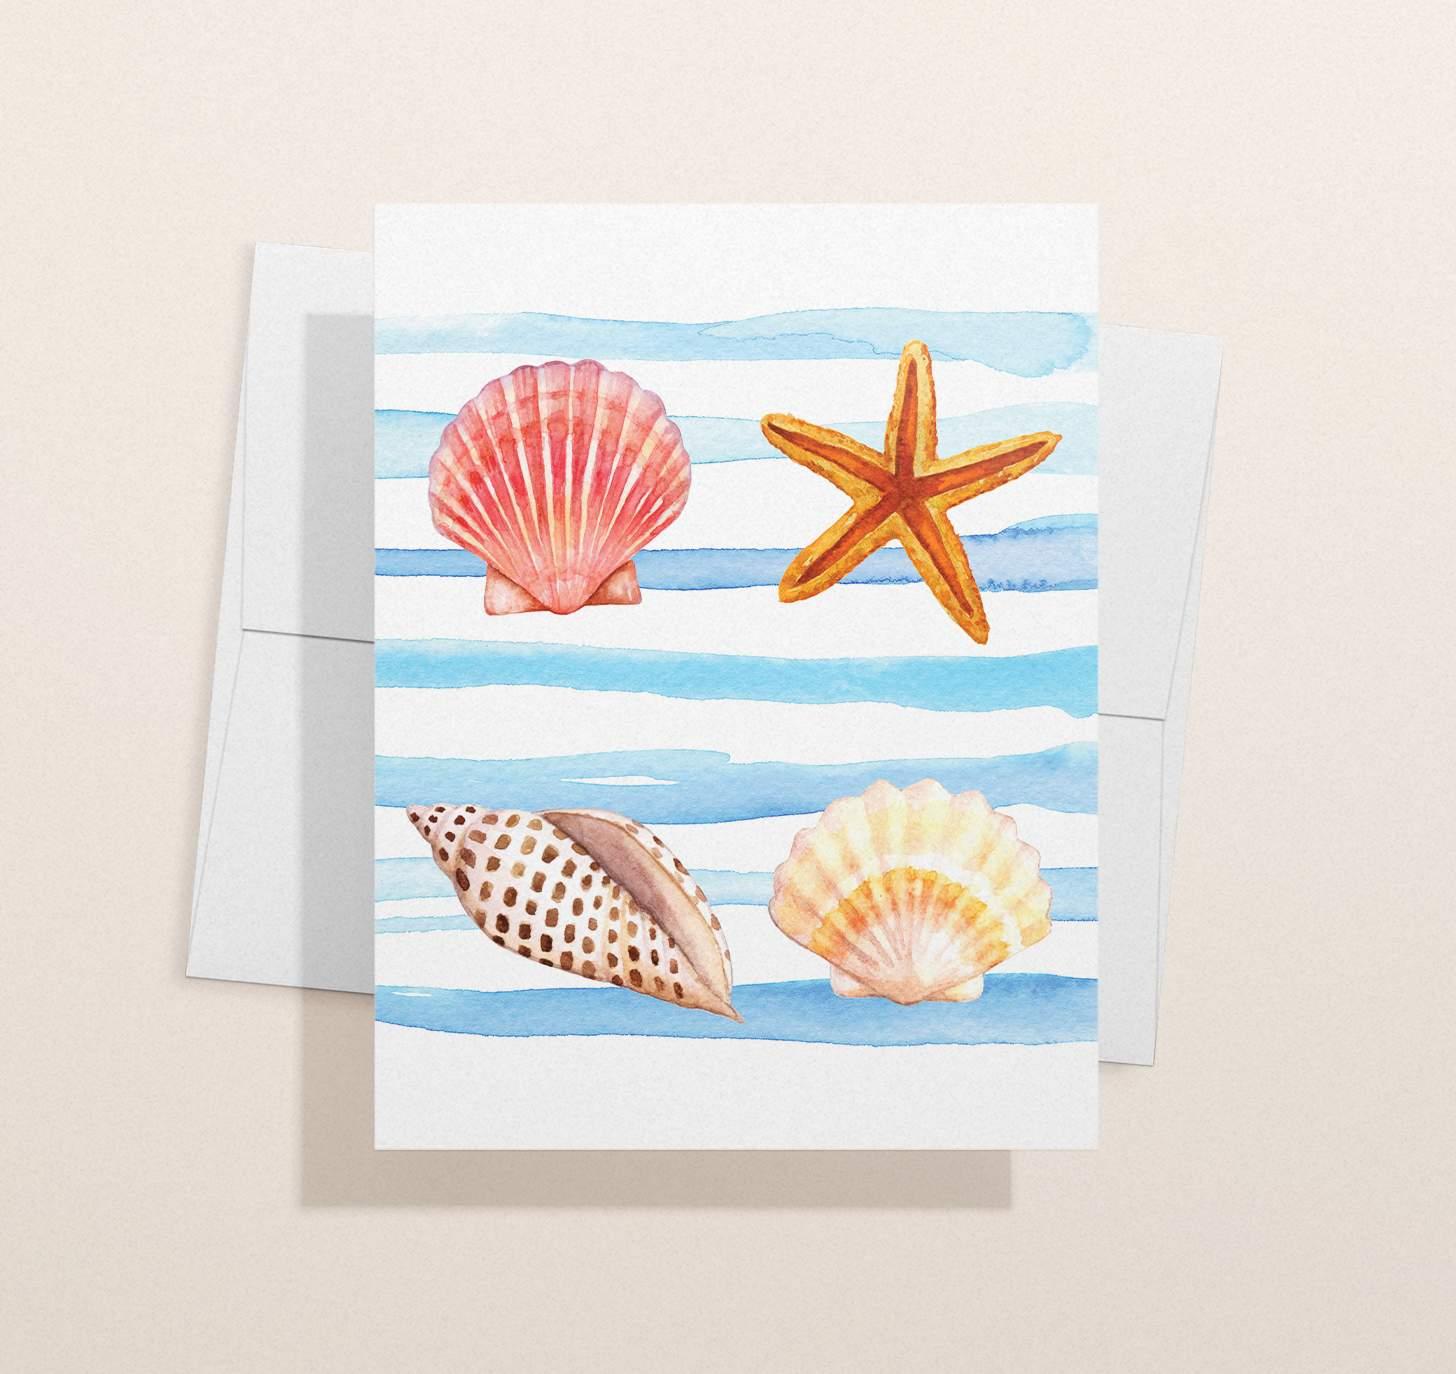 Watercolor seashells design with envelope